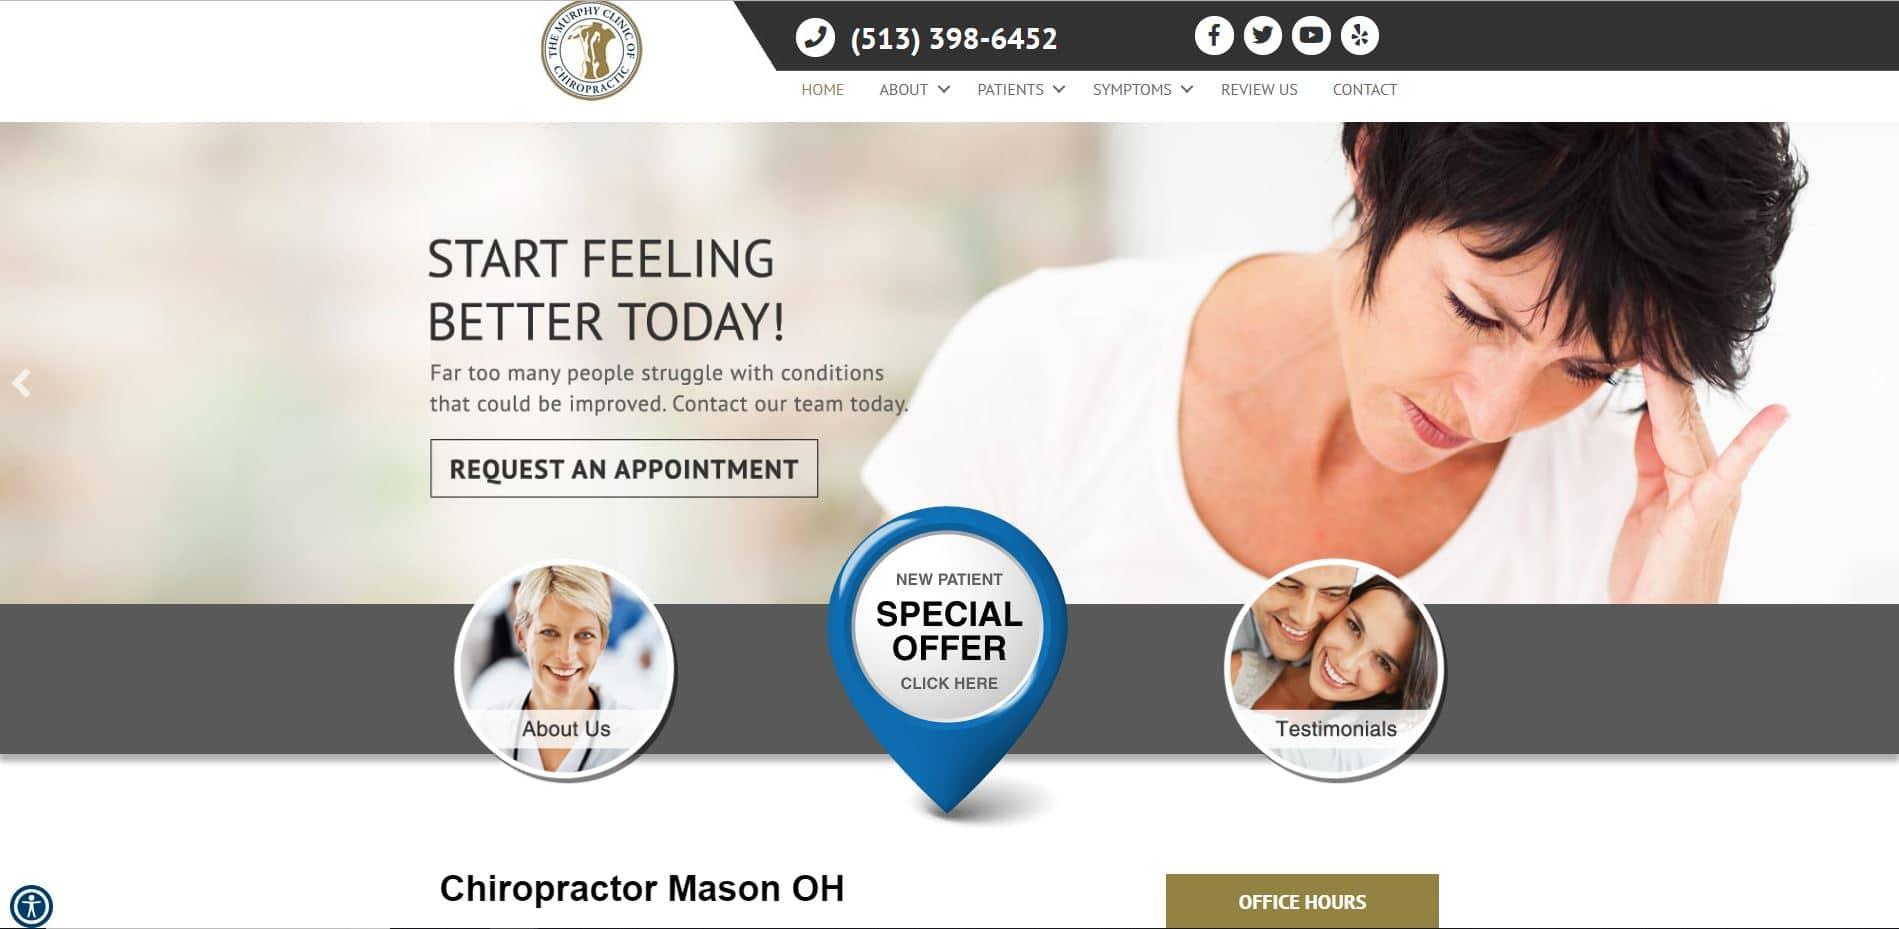 Chiropractor in Mason